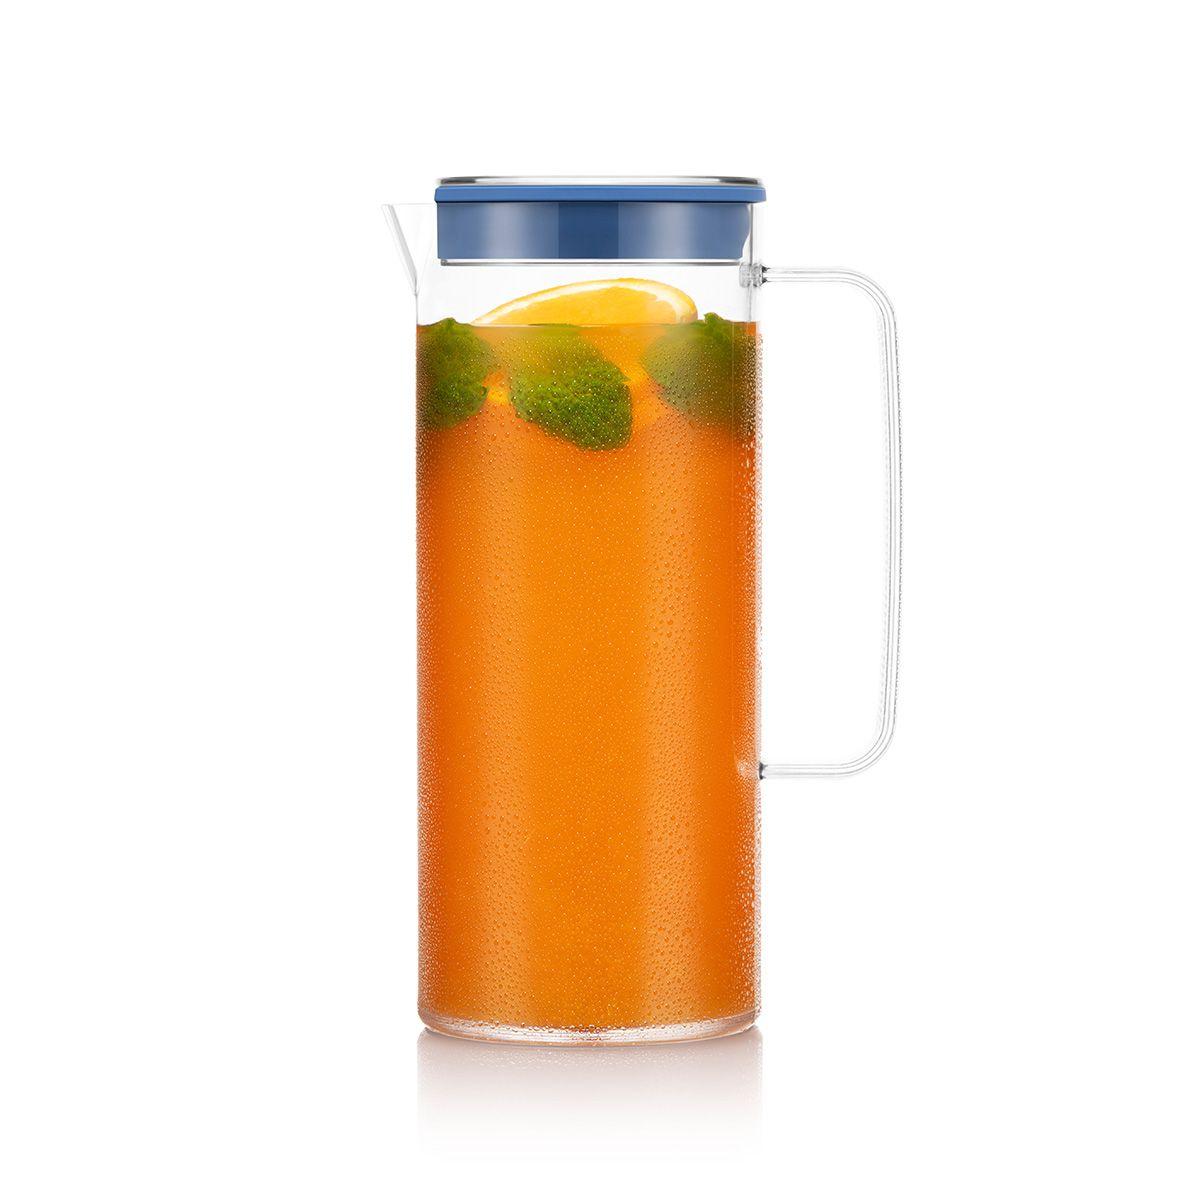 melior, water jug